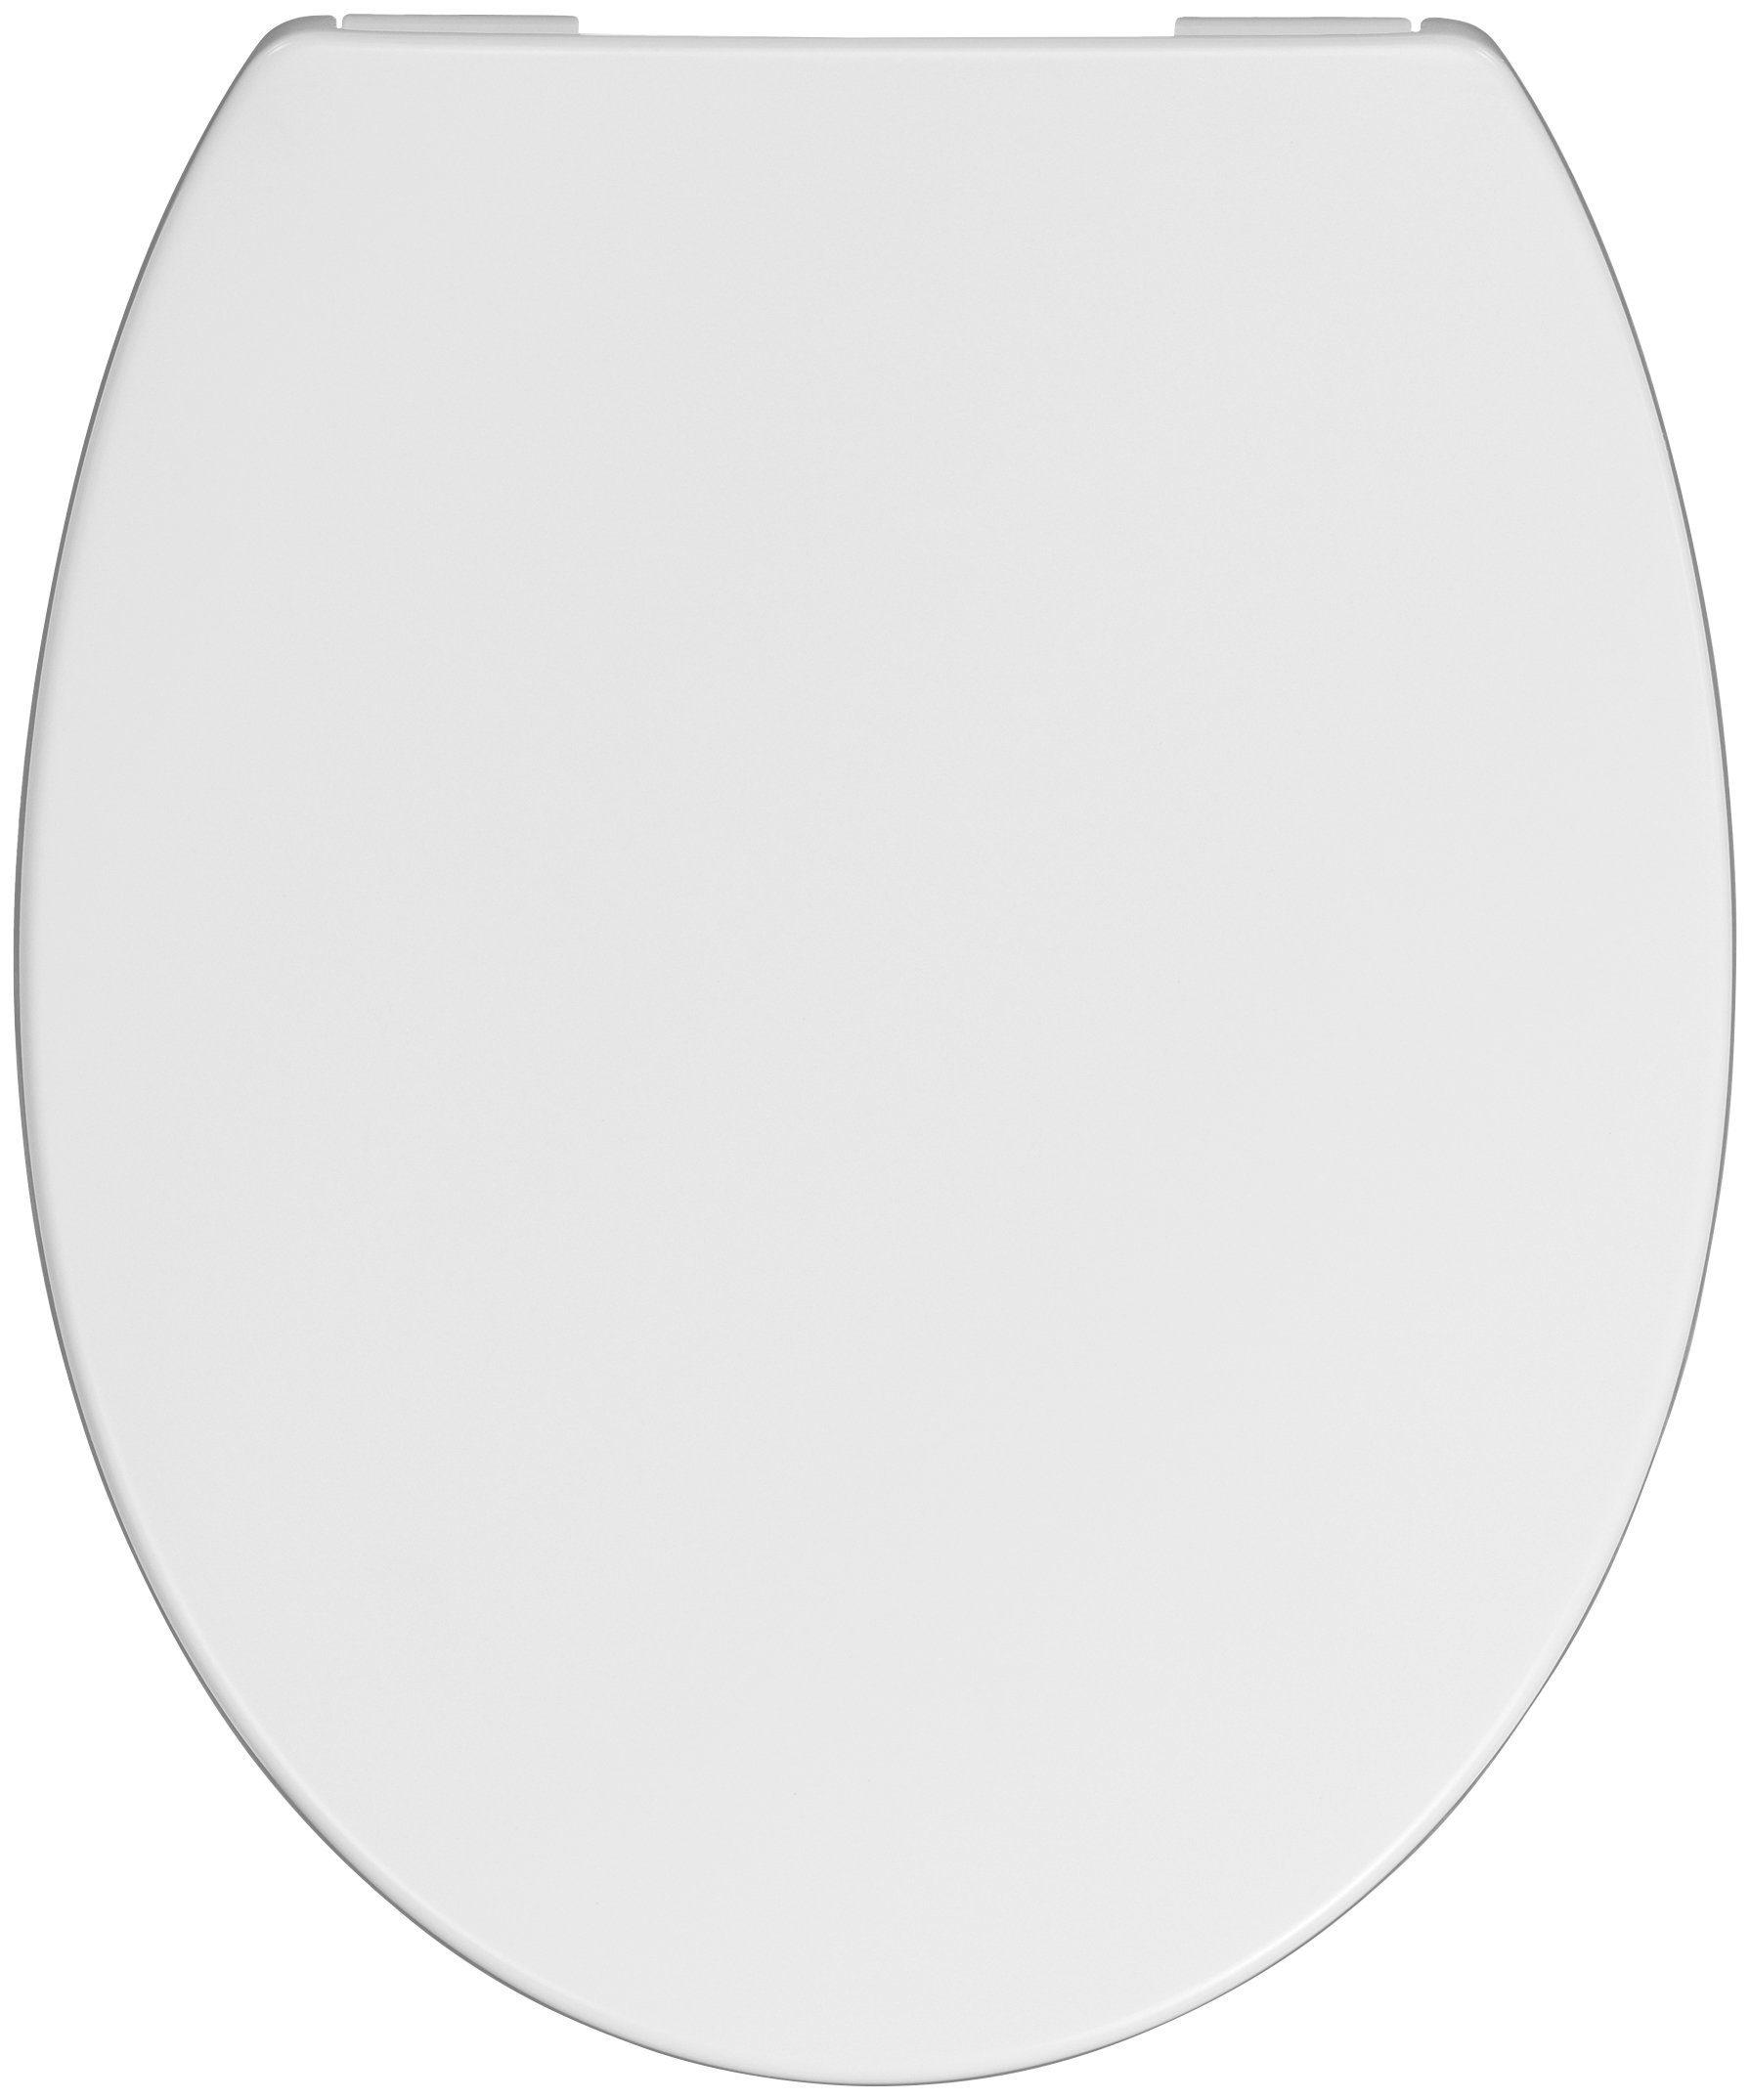 WC-Sitz »Pianora«, Mit Absenkautomatik